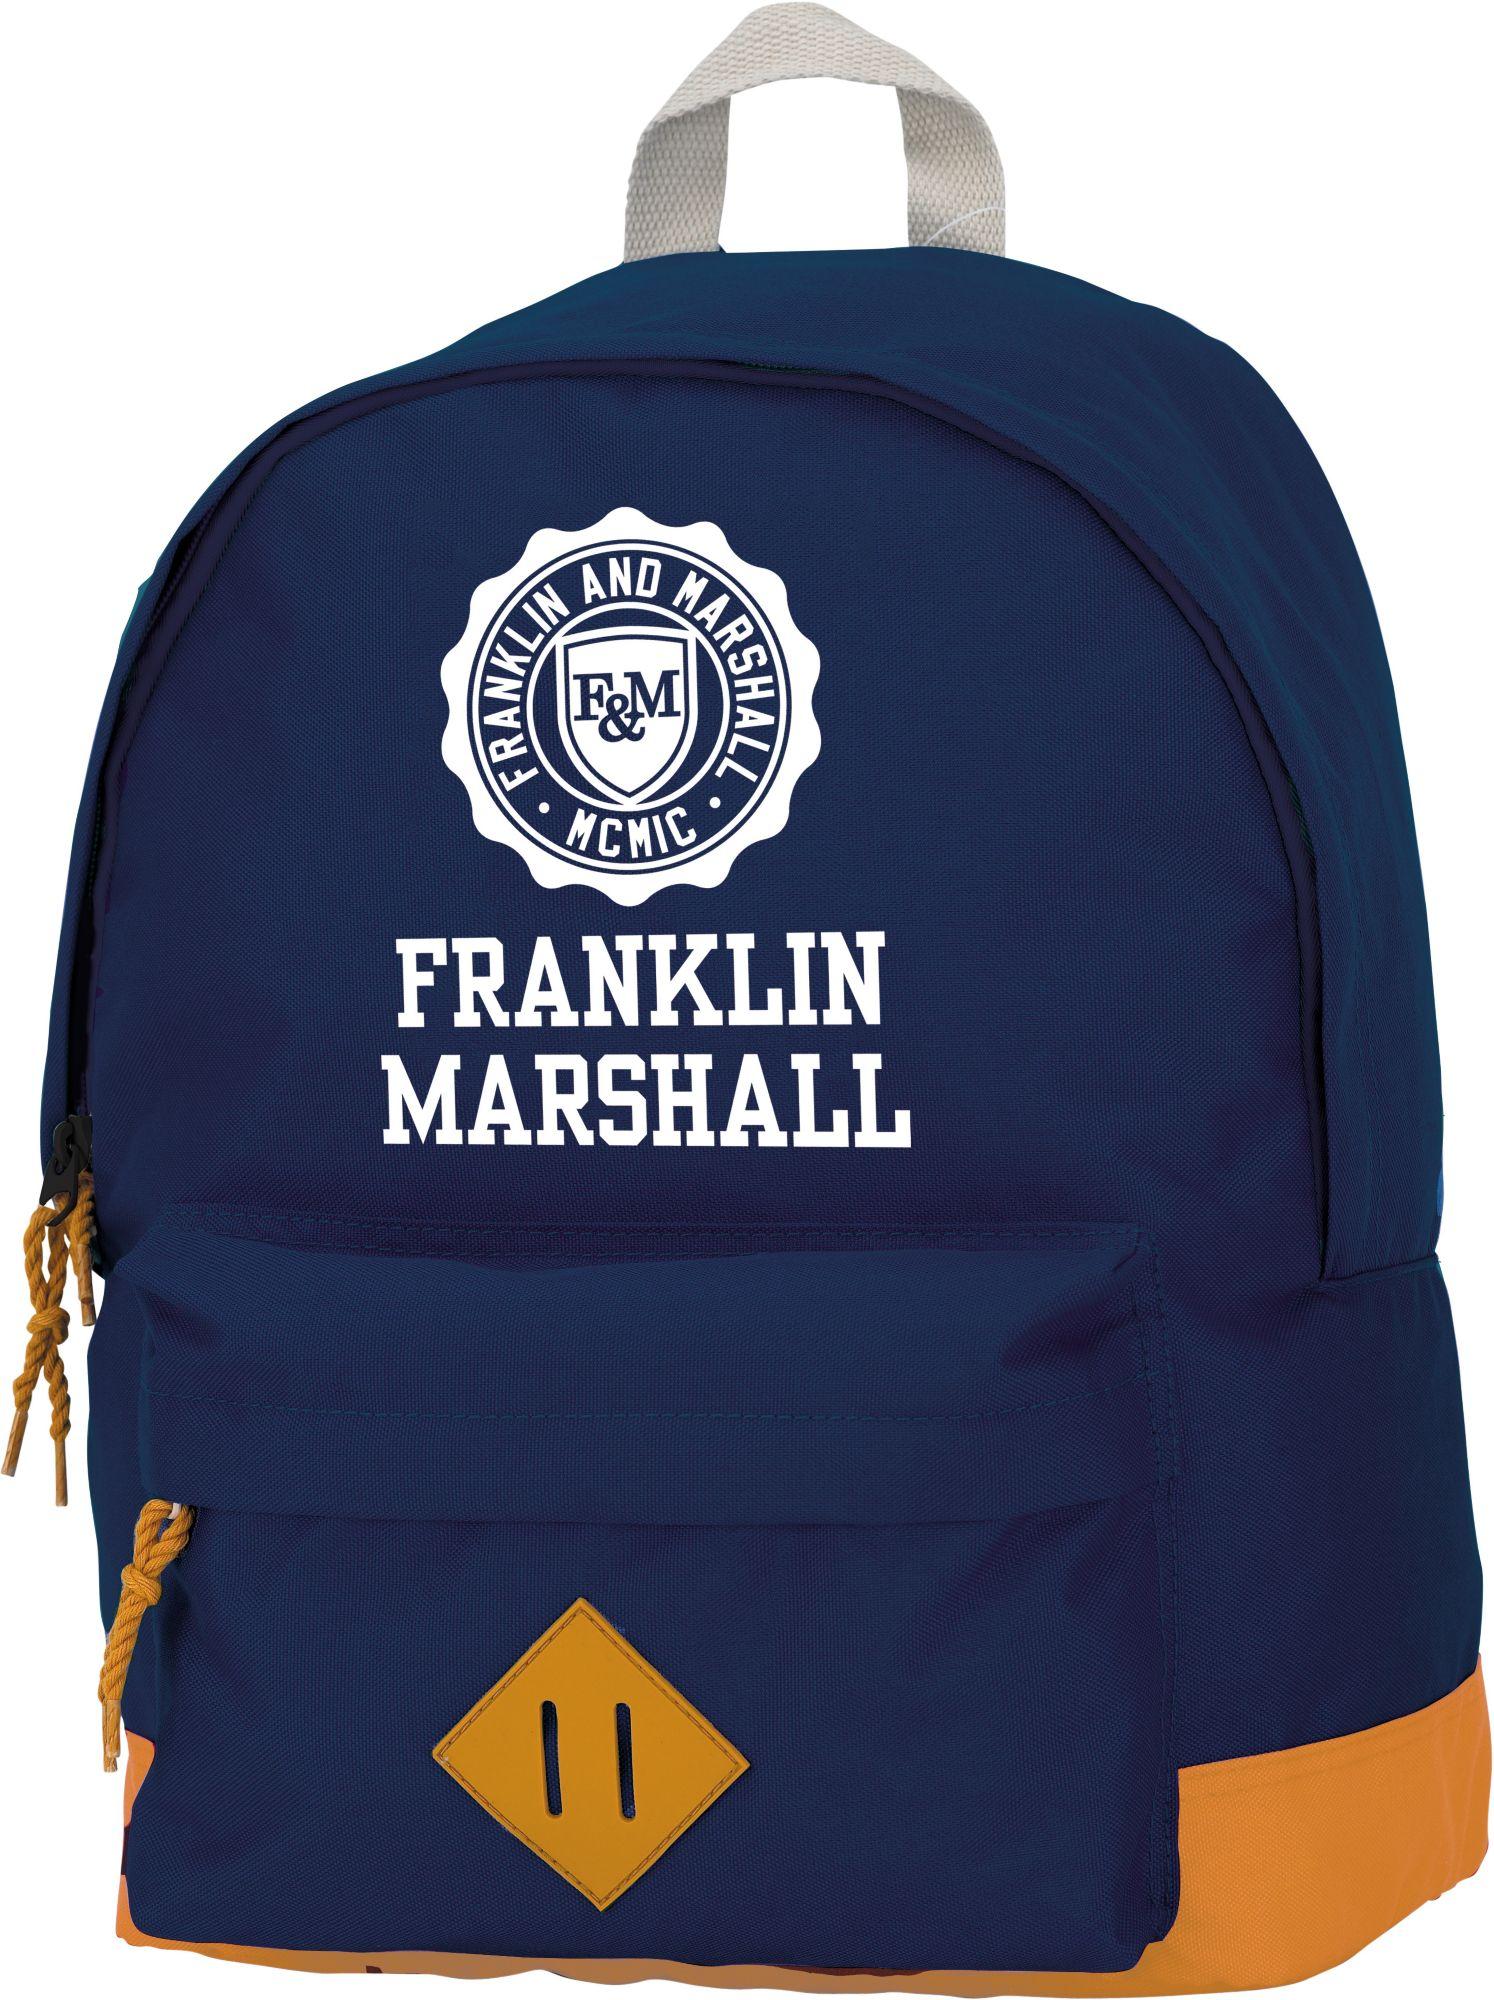 FRANKLIN MARSHALL Franklin & Marshall, Rucksack mit gummiertem Bodenschutz, »Boys Backpack dunkelblau, groß«